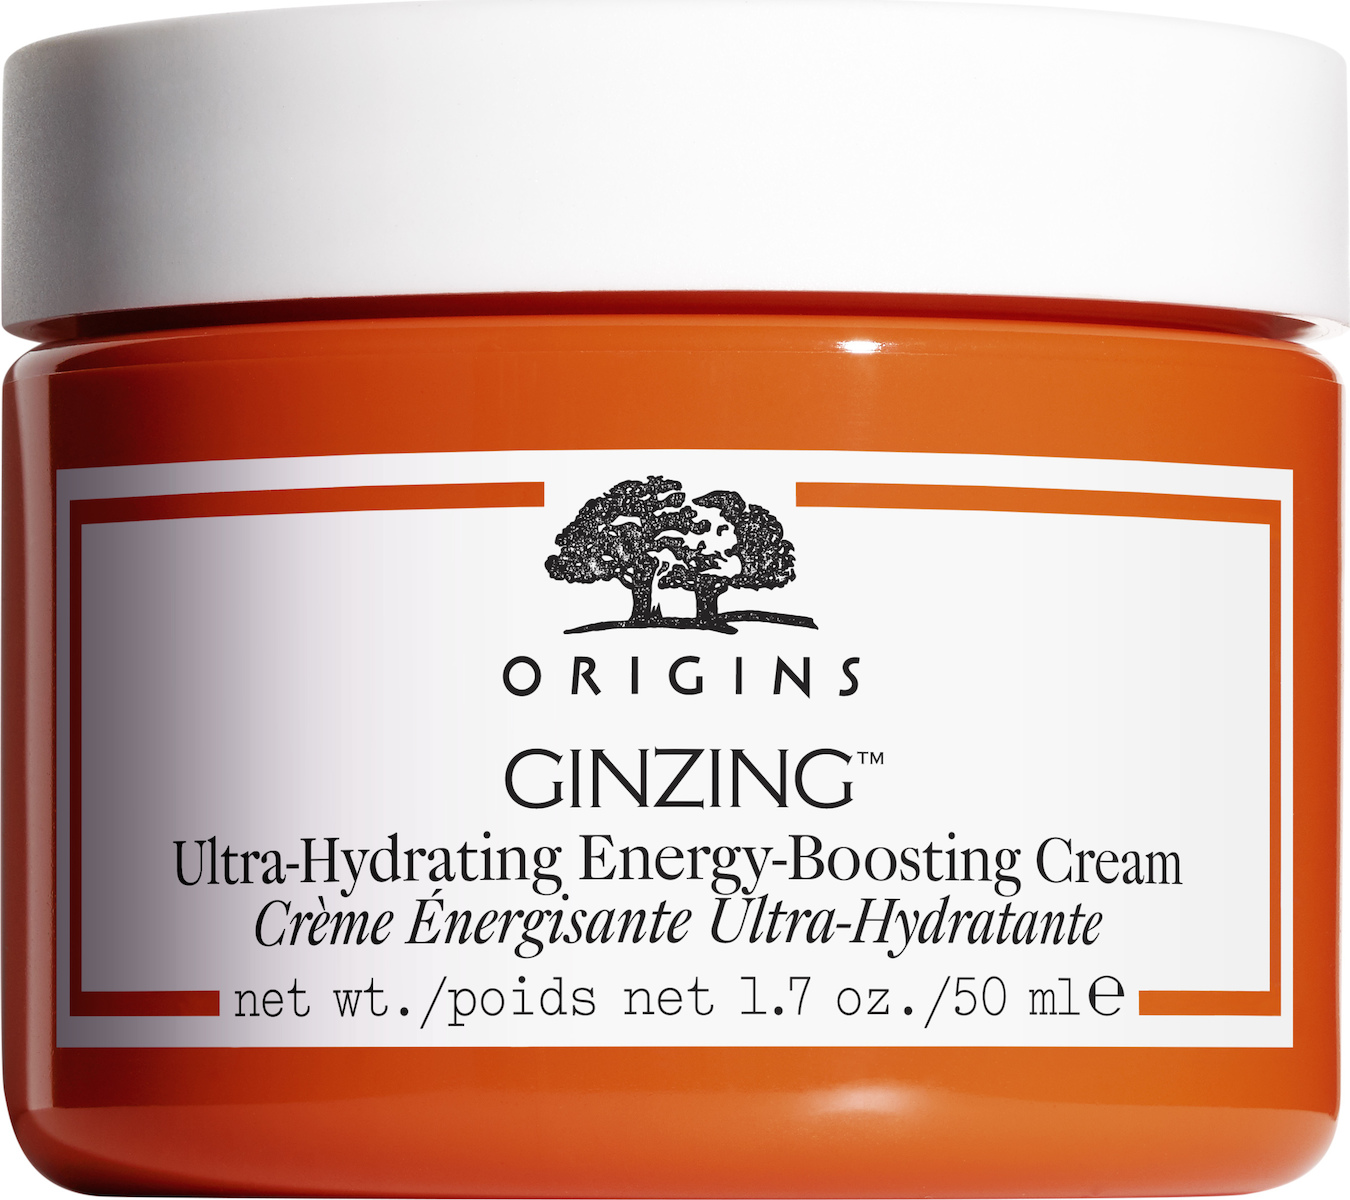 Origins - Ginzing Ultra Hydrating Energy Boosting Cream 50ml